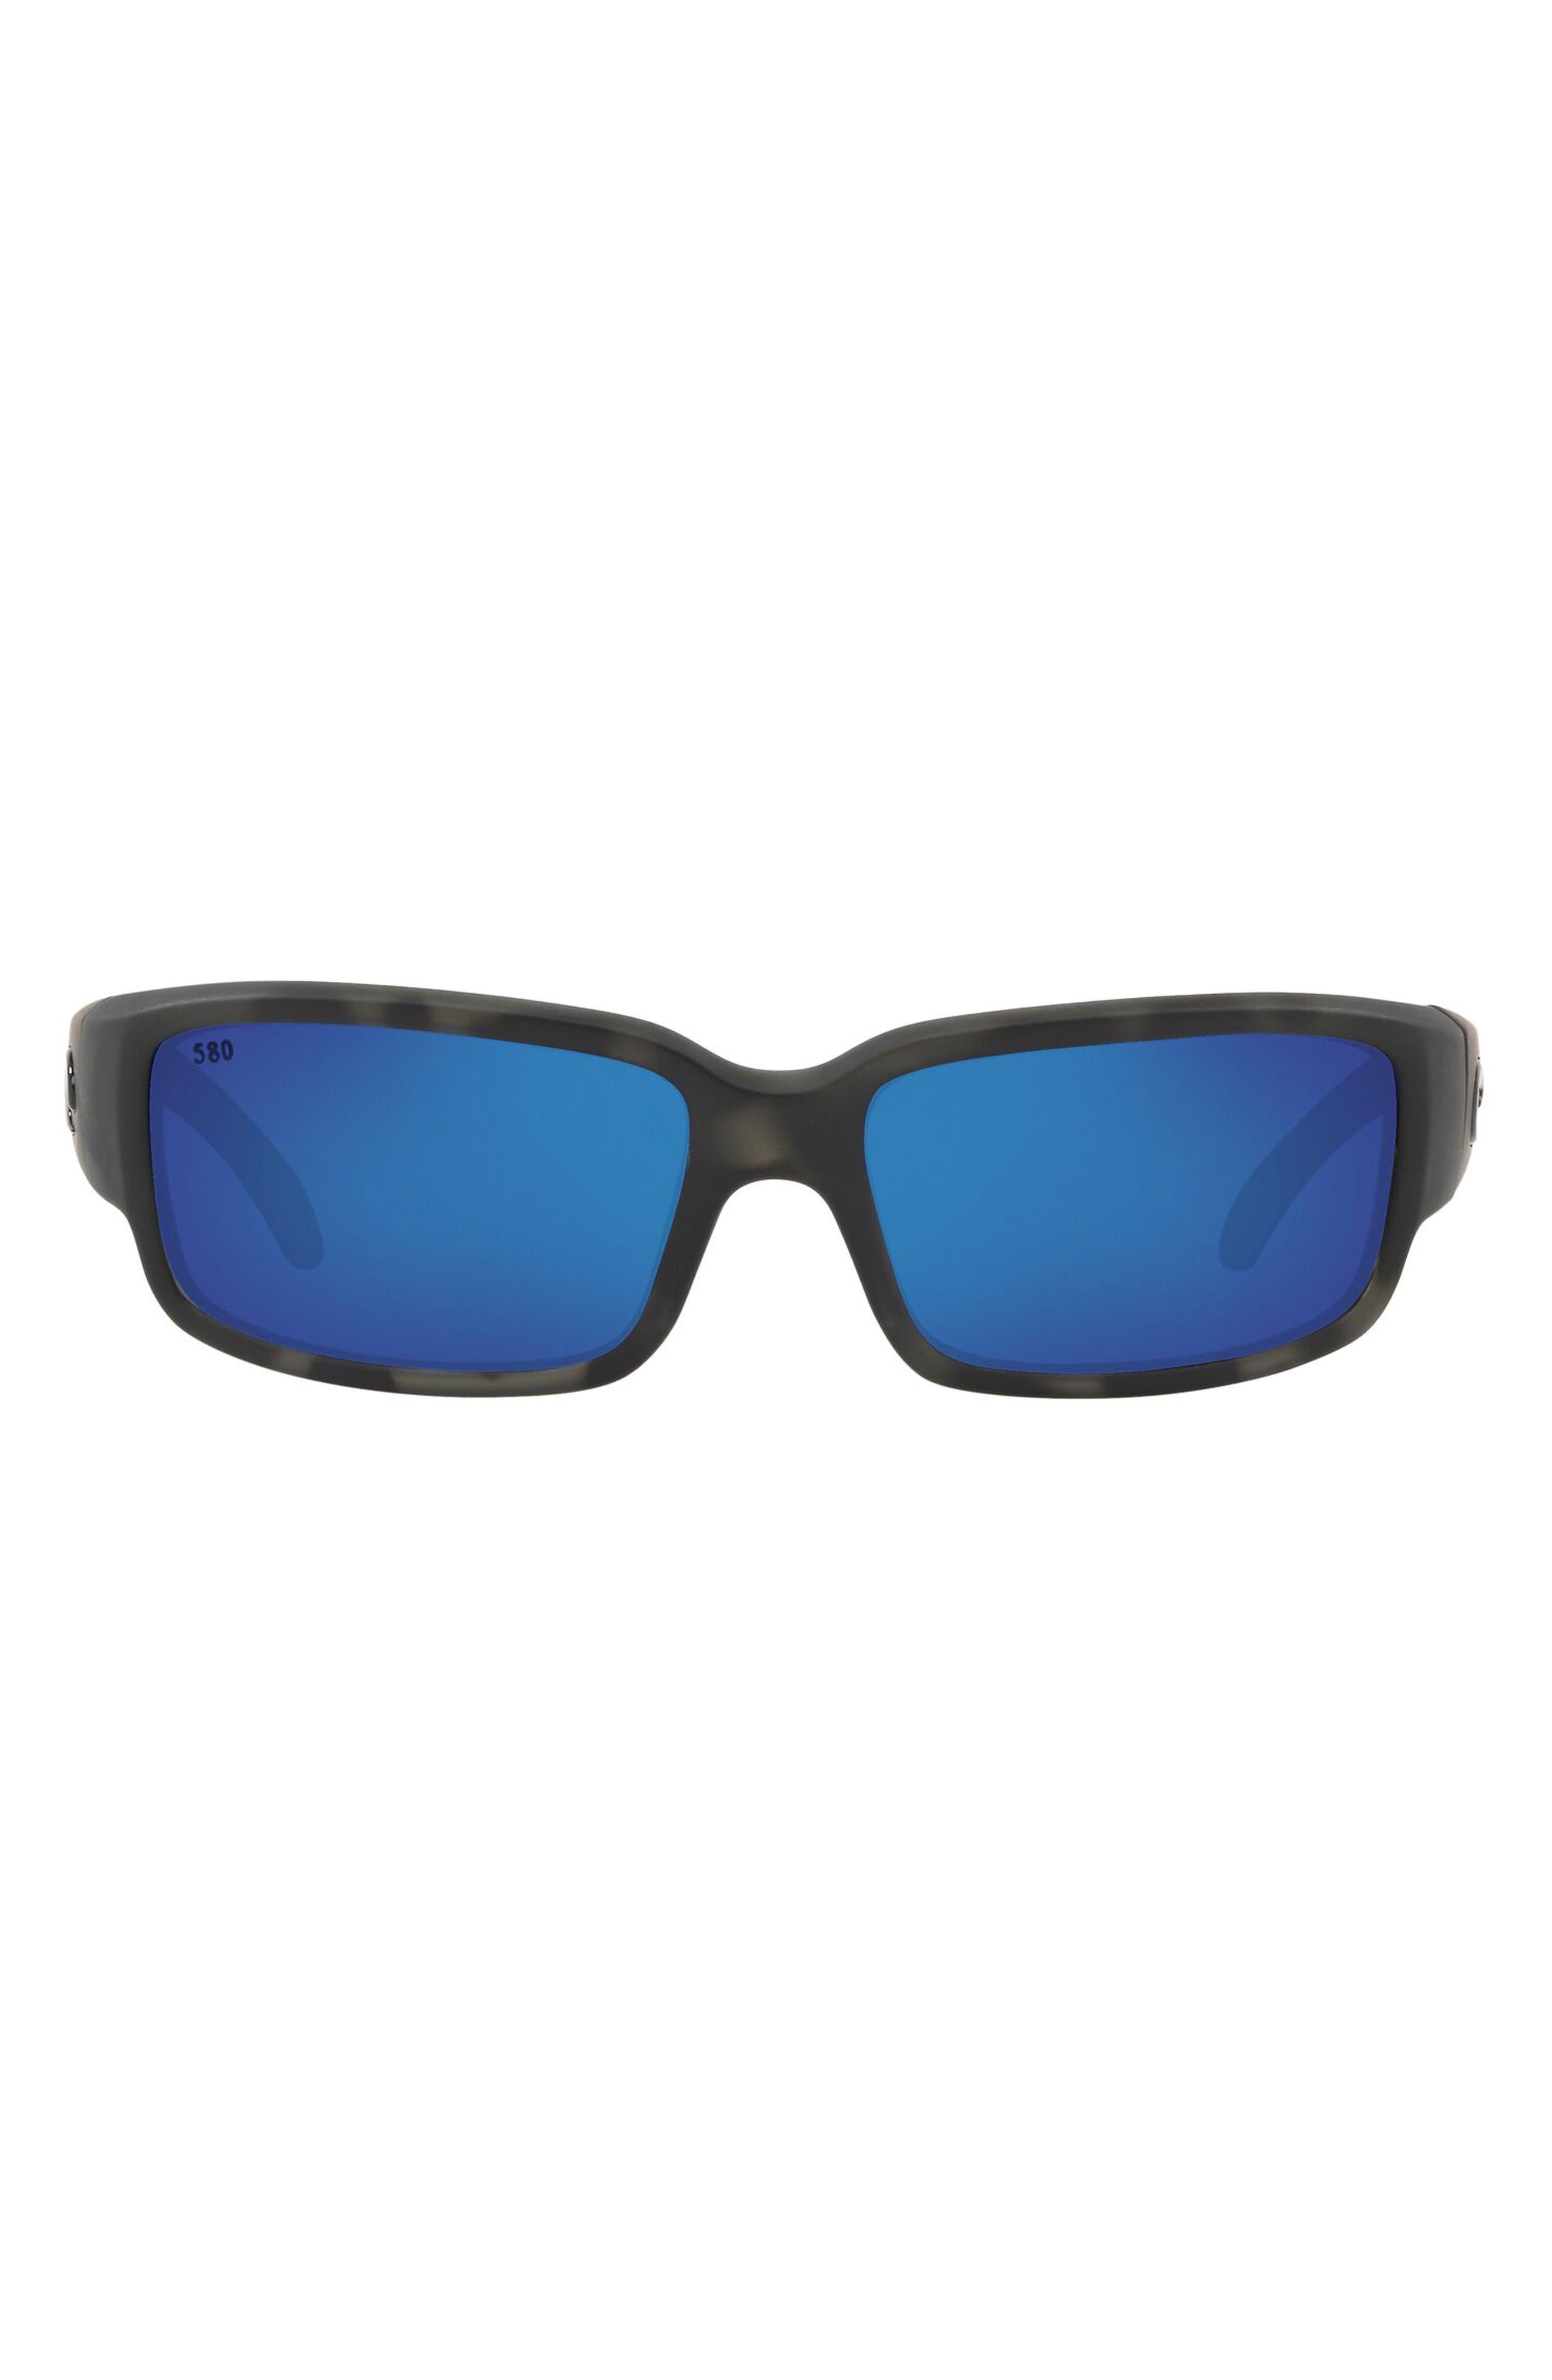 59mm Polarized Rectangular Sunglasses